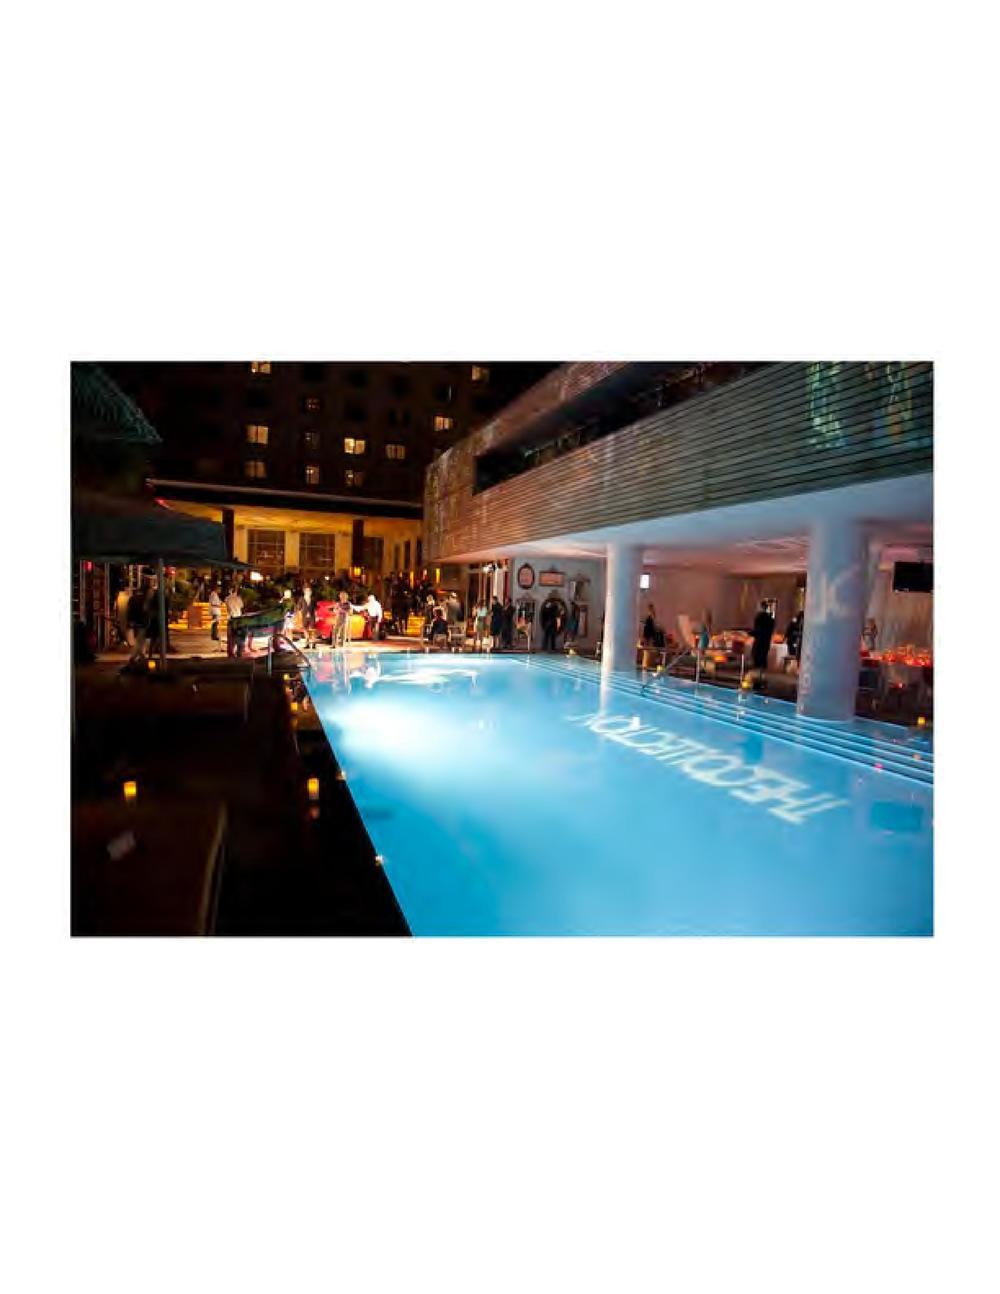 Miami_Art_Basel_Photographs-web-page-108.jpg